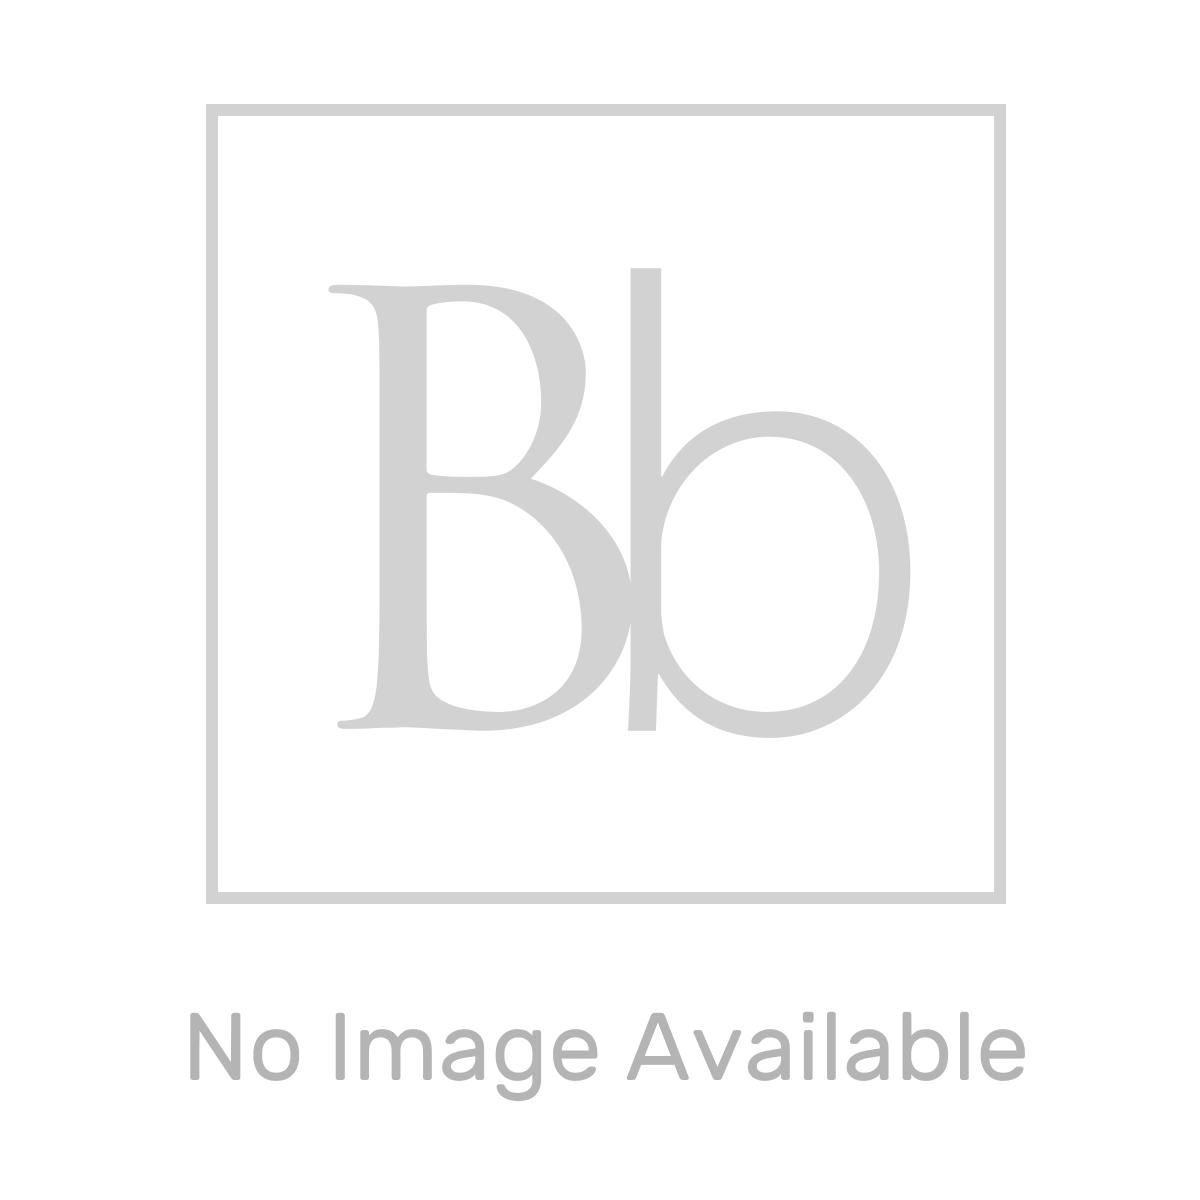 RAK Morning 1 Tap Hole Basin with Semi Pedestal 600mm Measurements